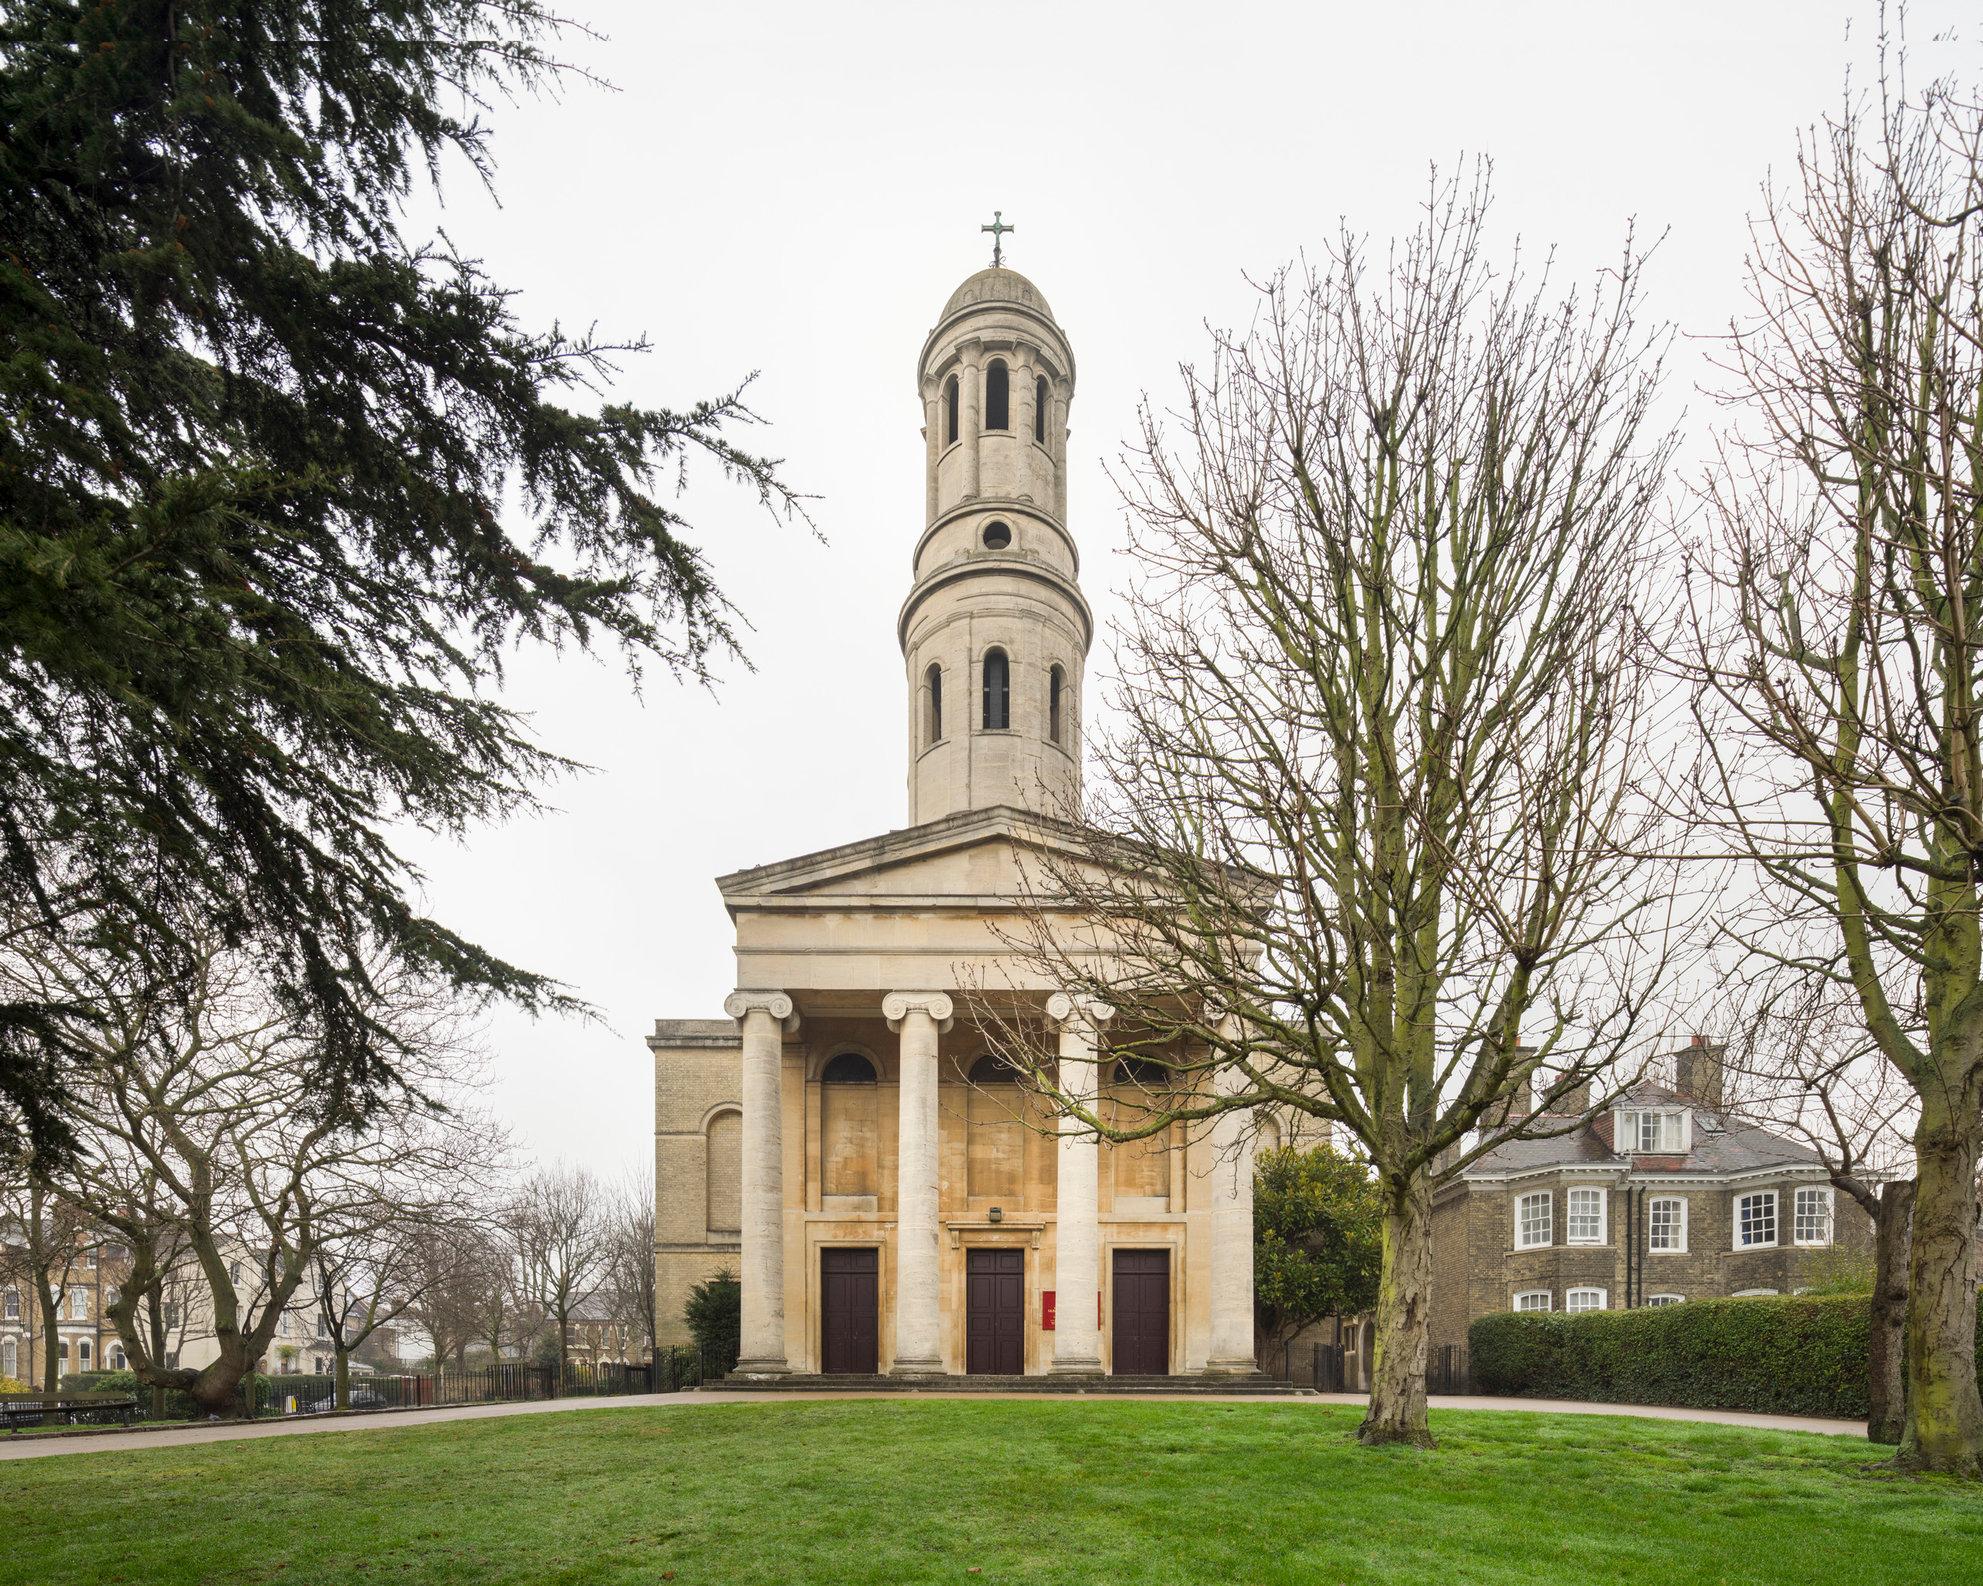 St Anne's, Wandsworth. Robert Smirke